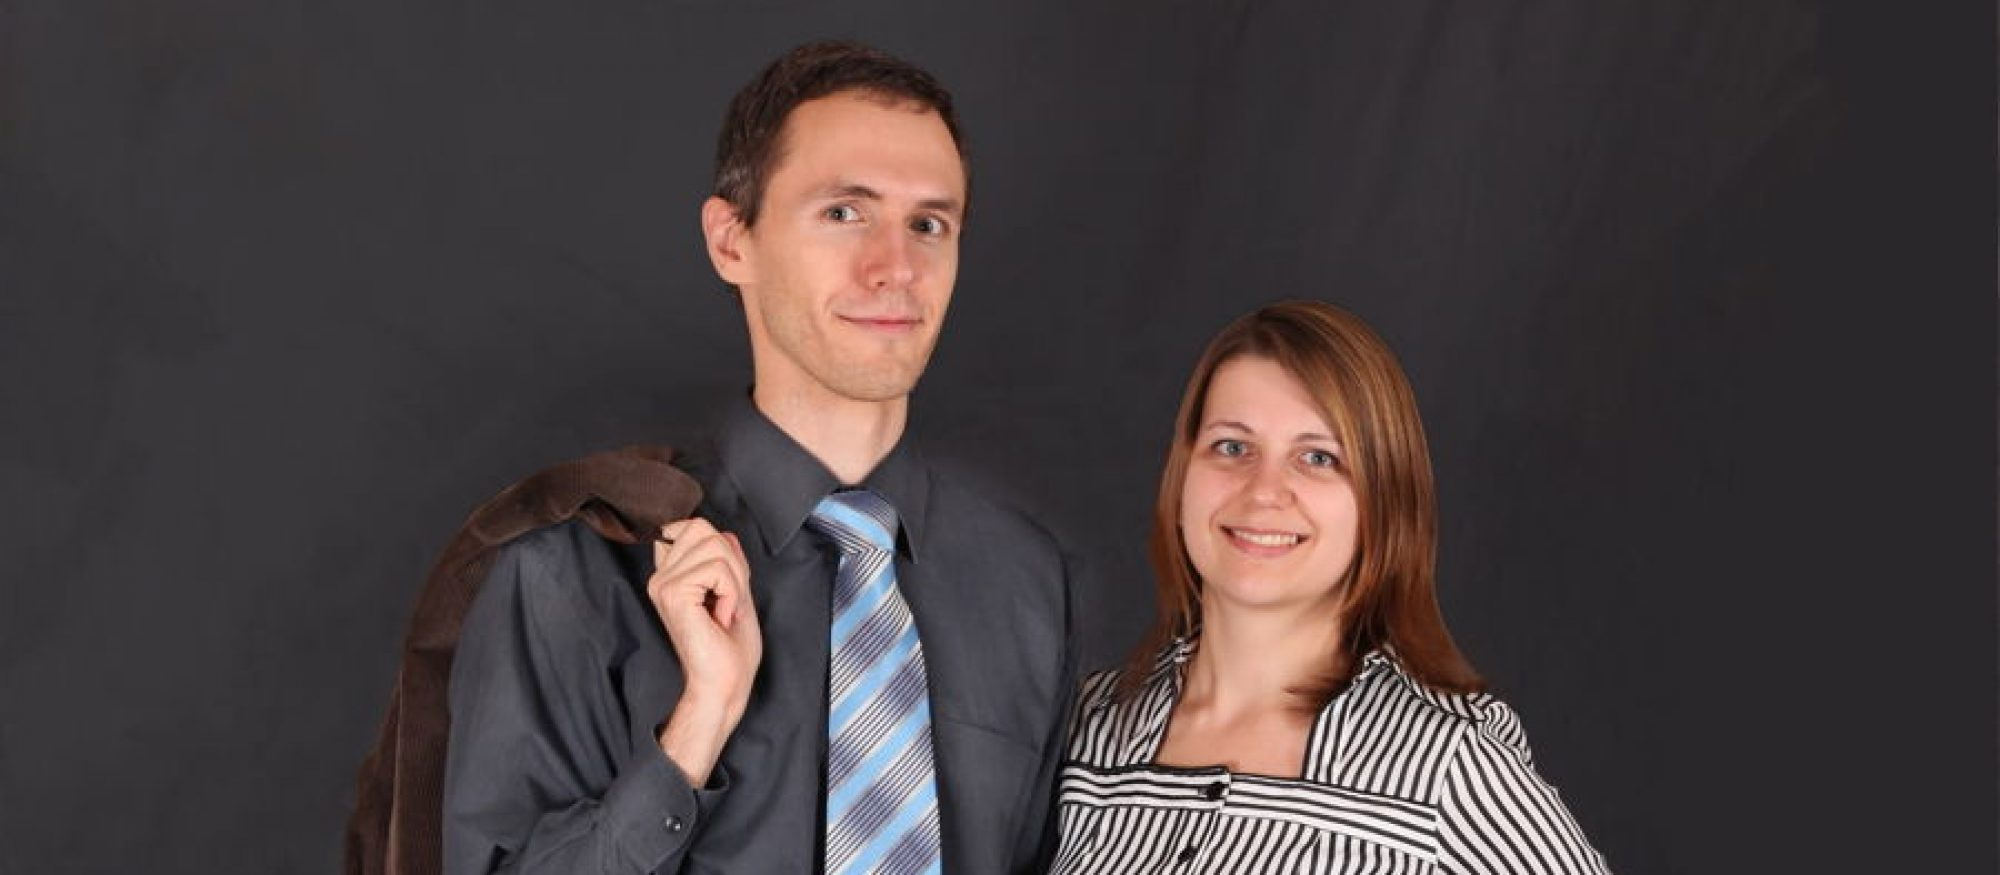 NLP & Hypnotherapy Blog by Timur Baytukalov and Tatiana Alexeeva